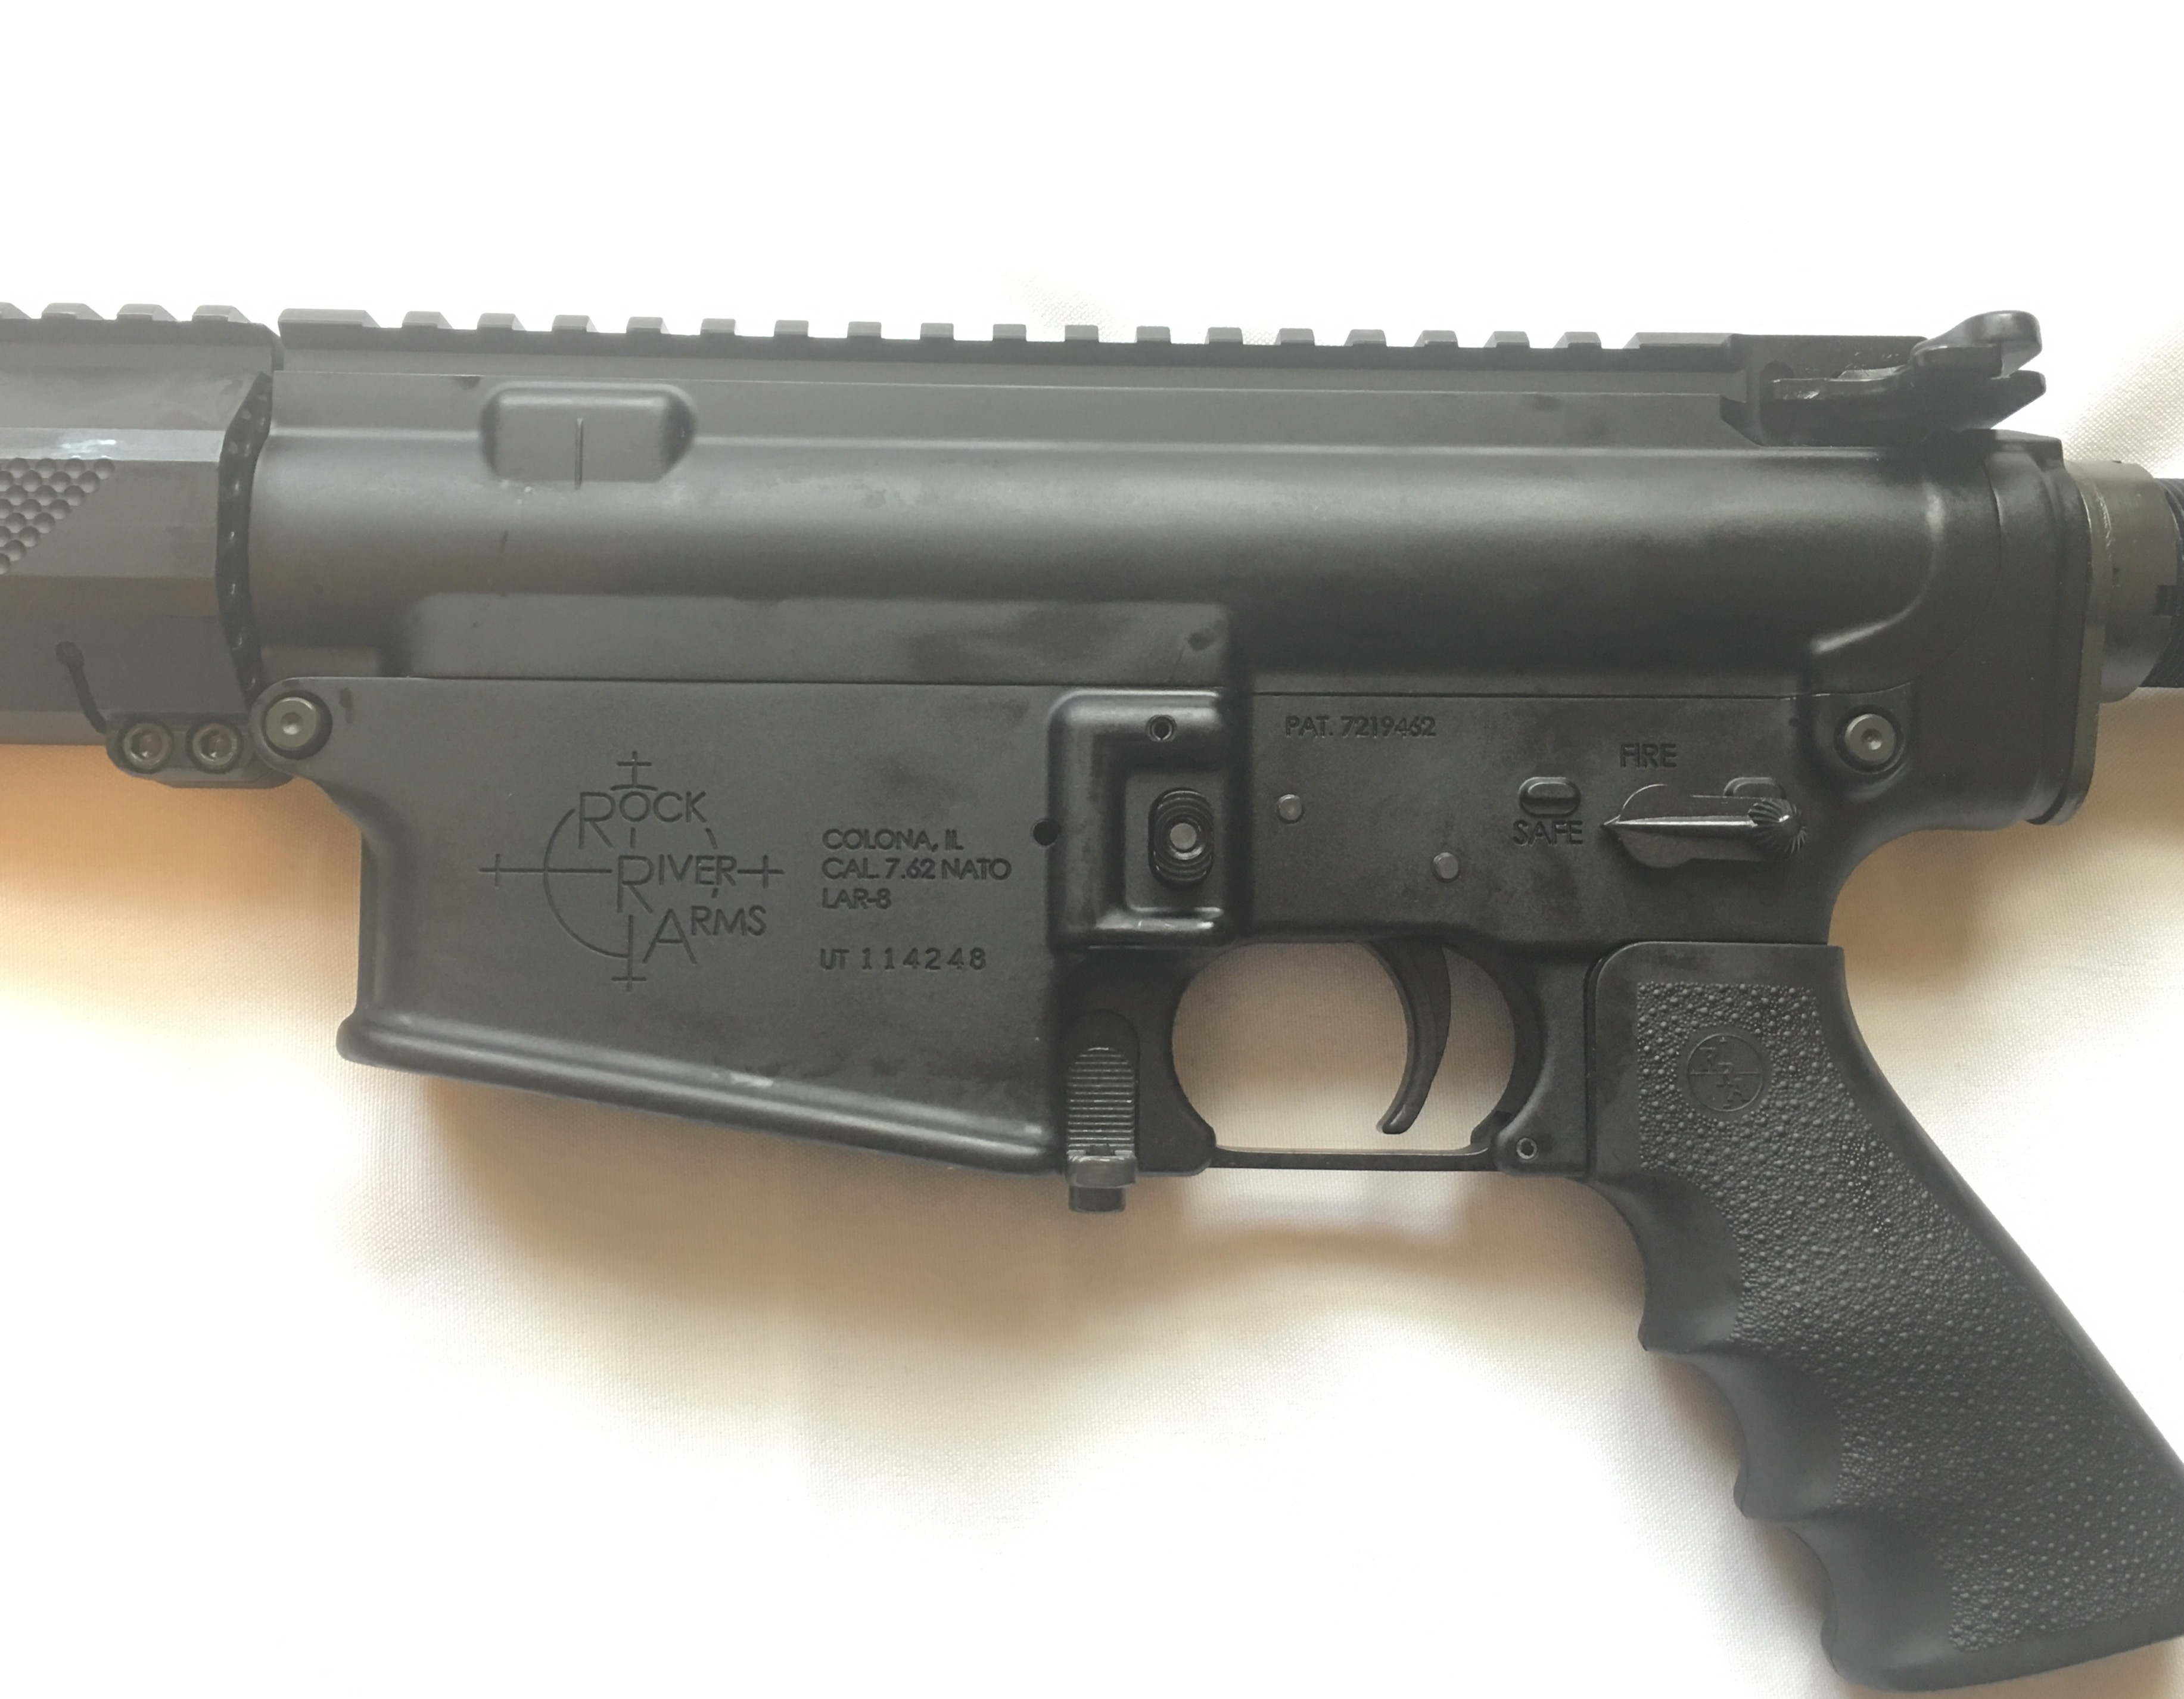 Lar-8 stock options